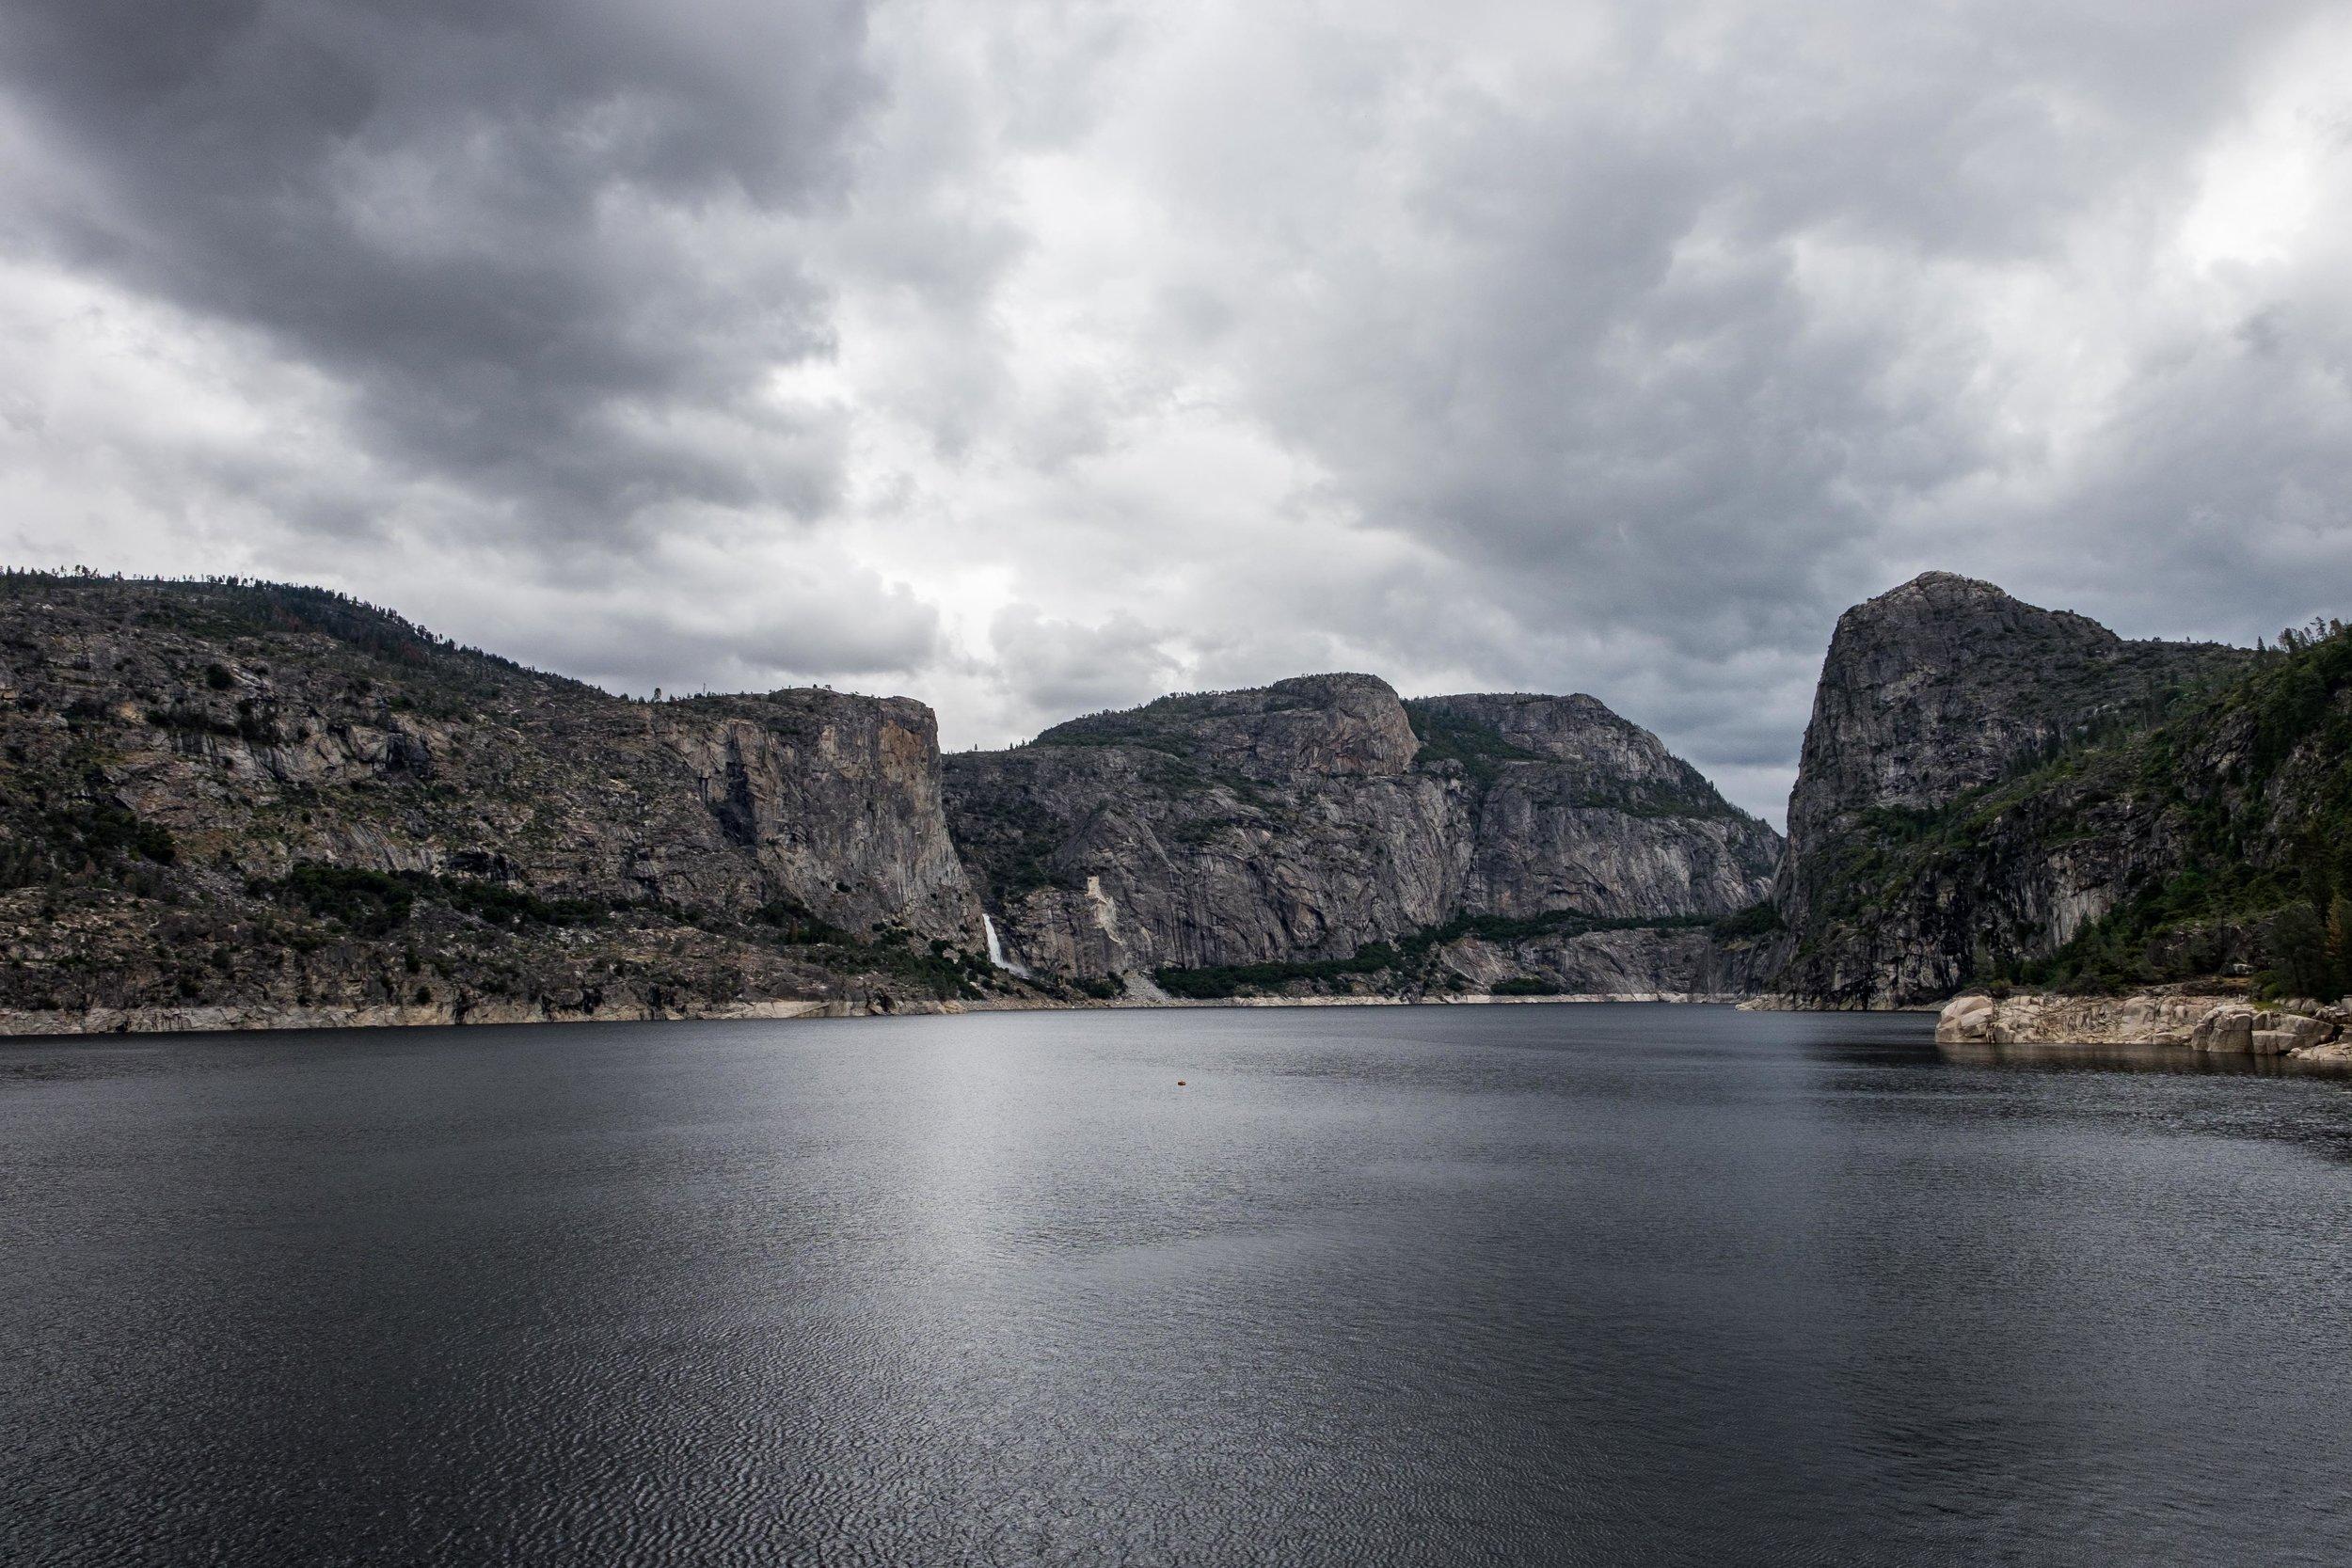 20160521-JI-Yosemite National Park-_DSF7655.jpg